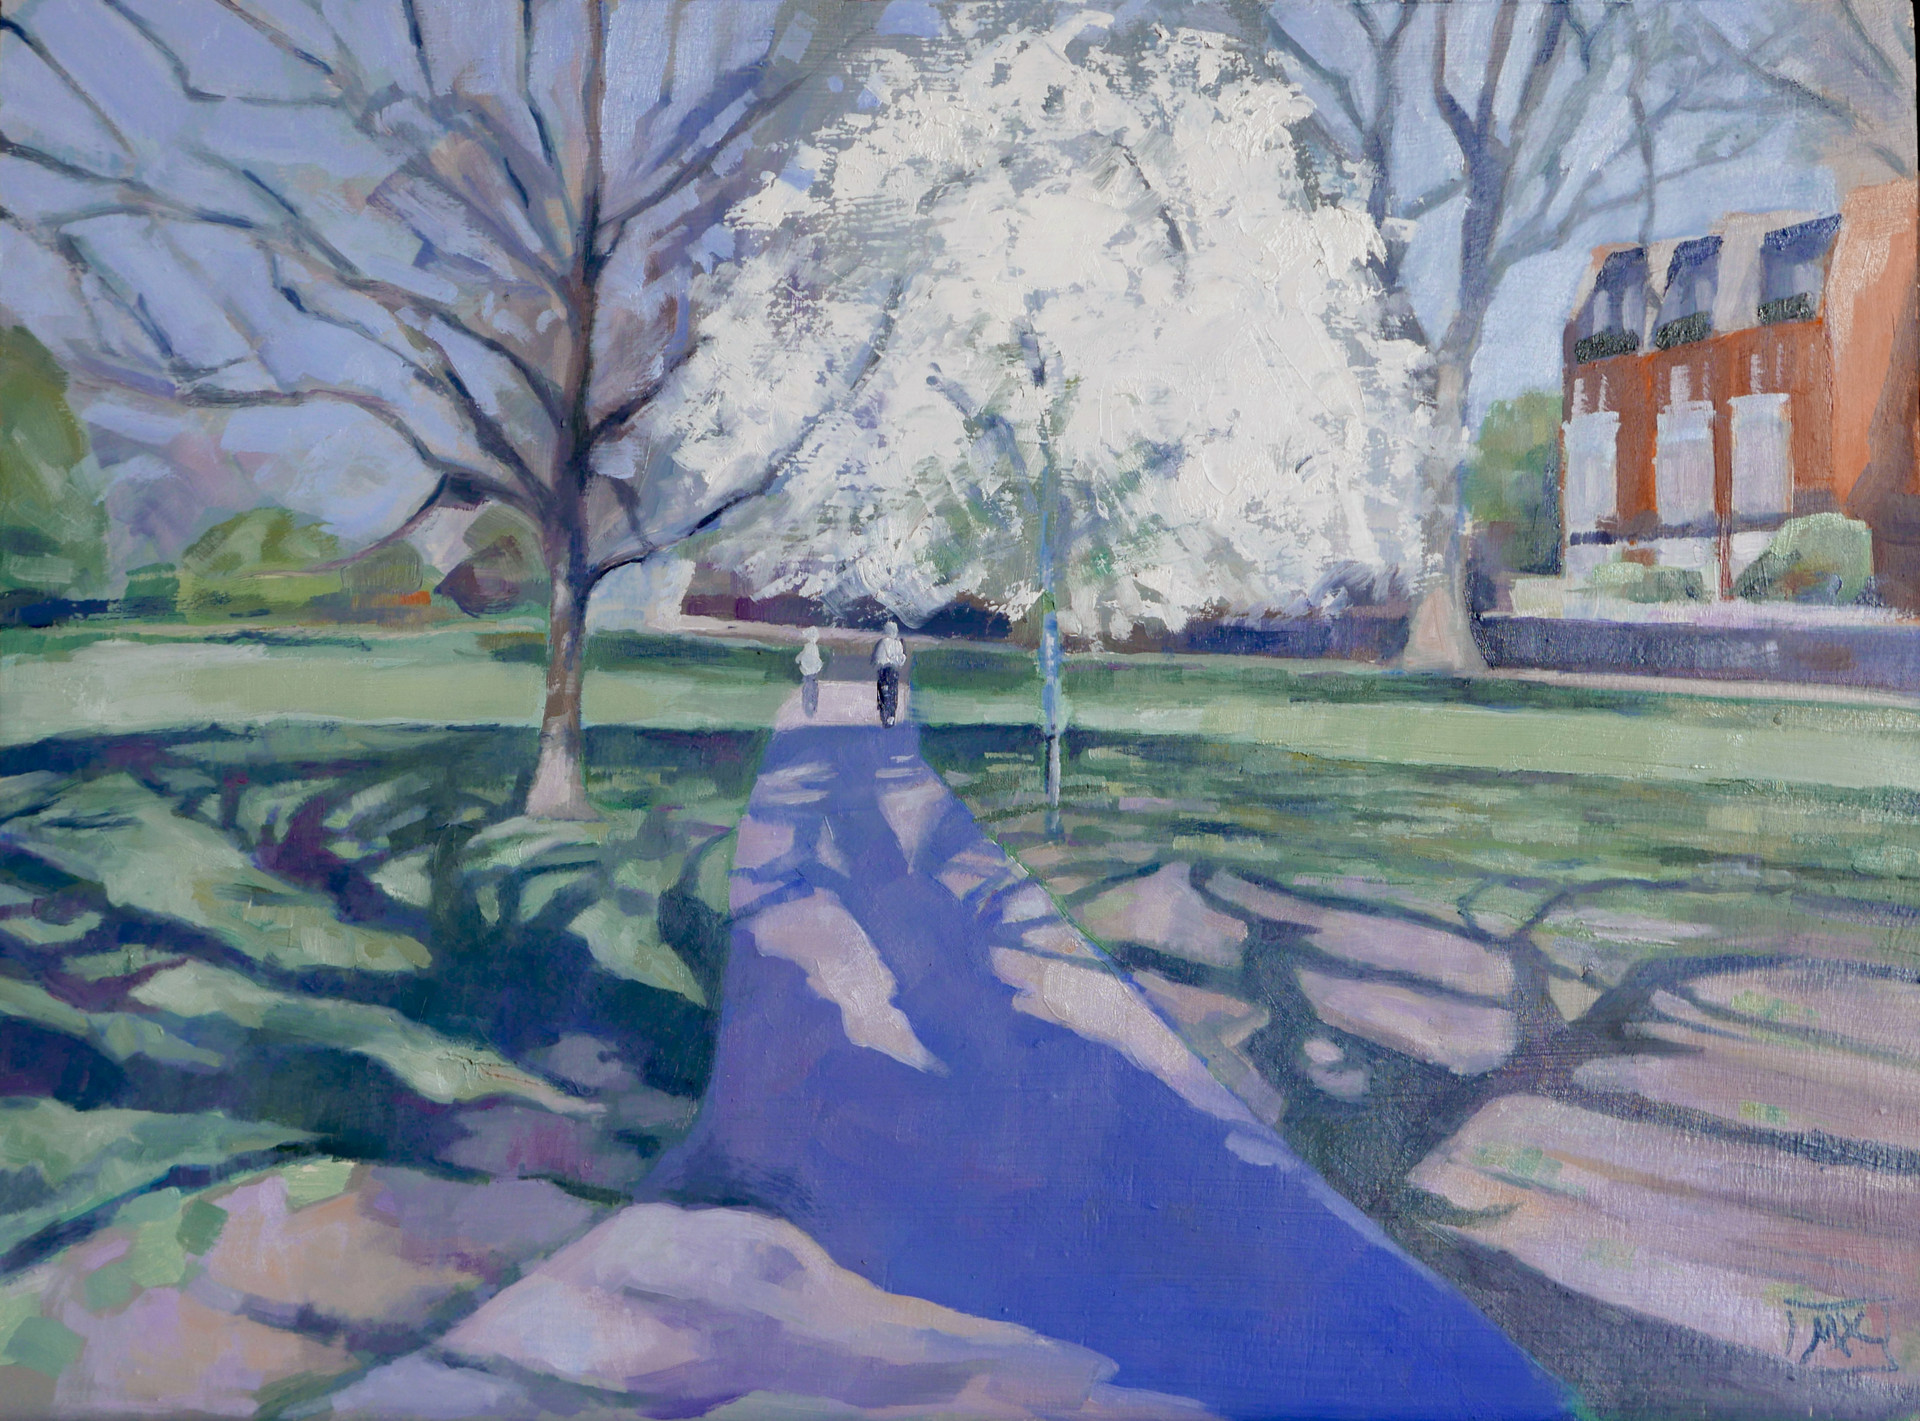 Eel Brook Common Blossom